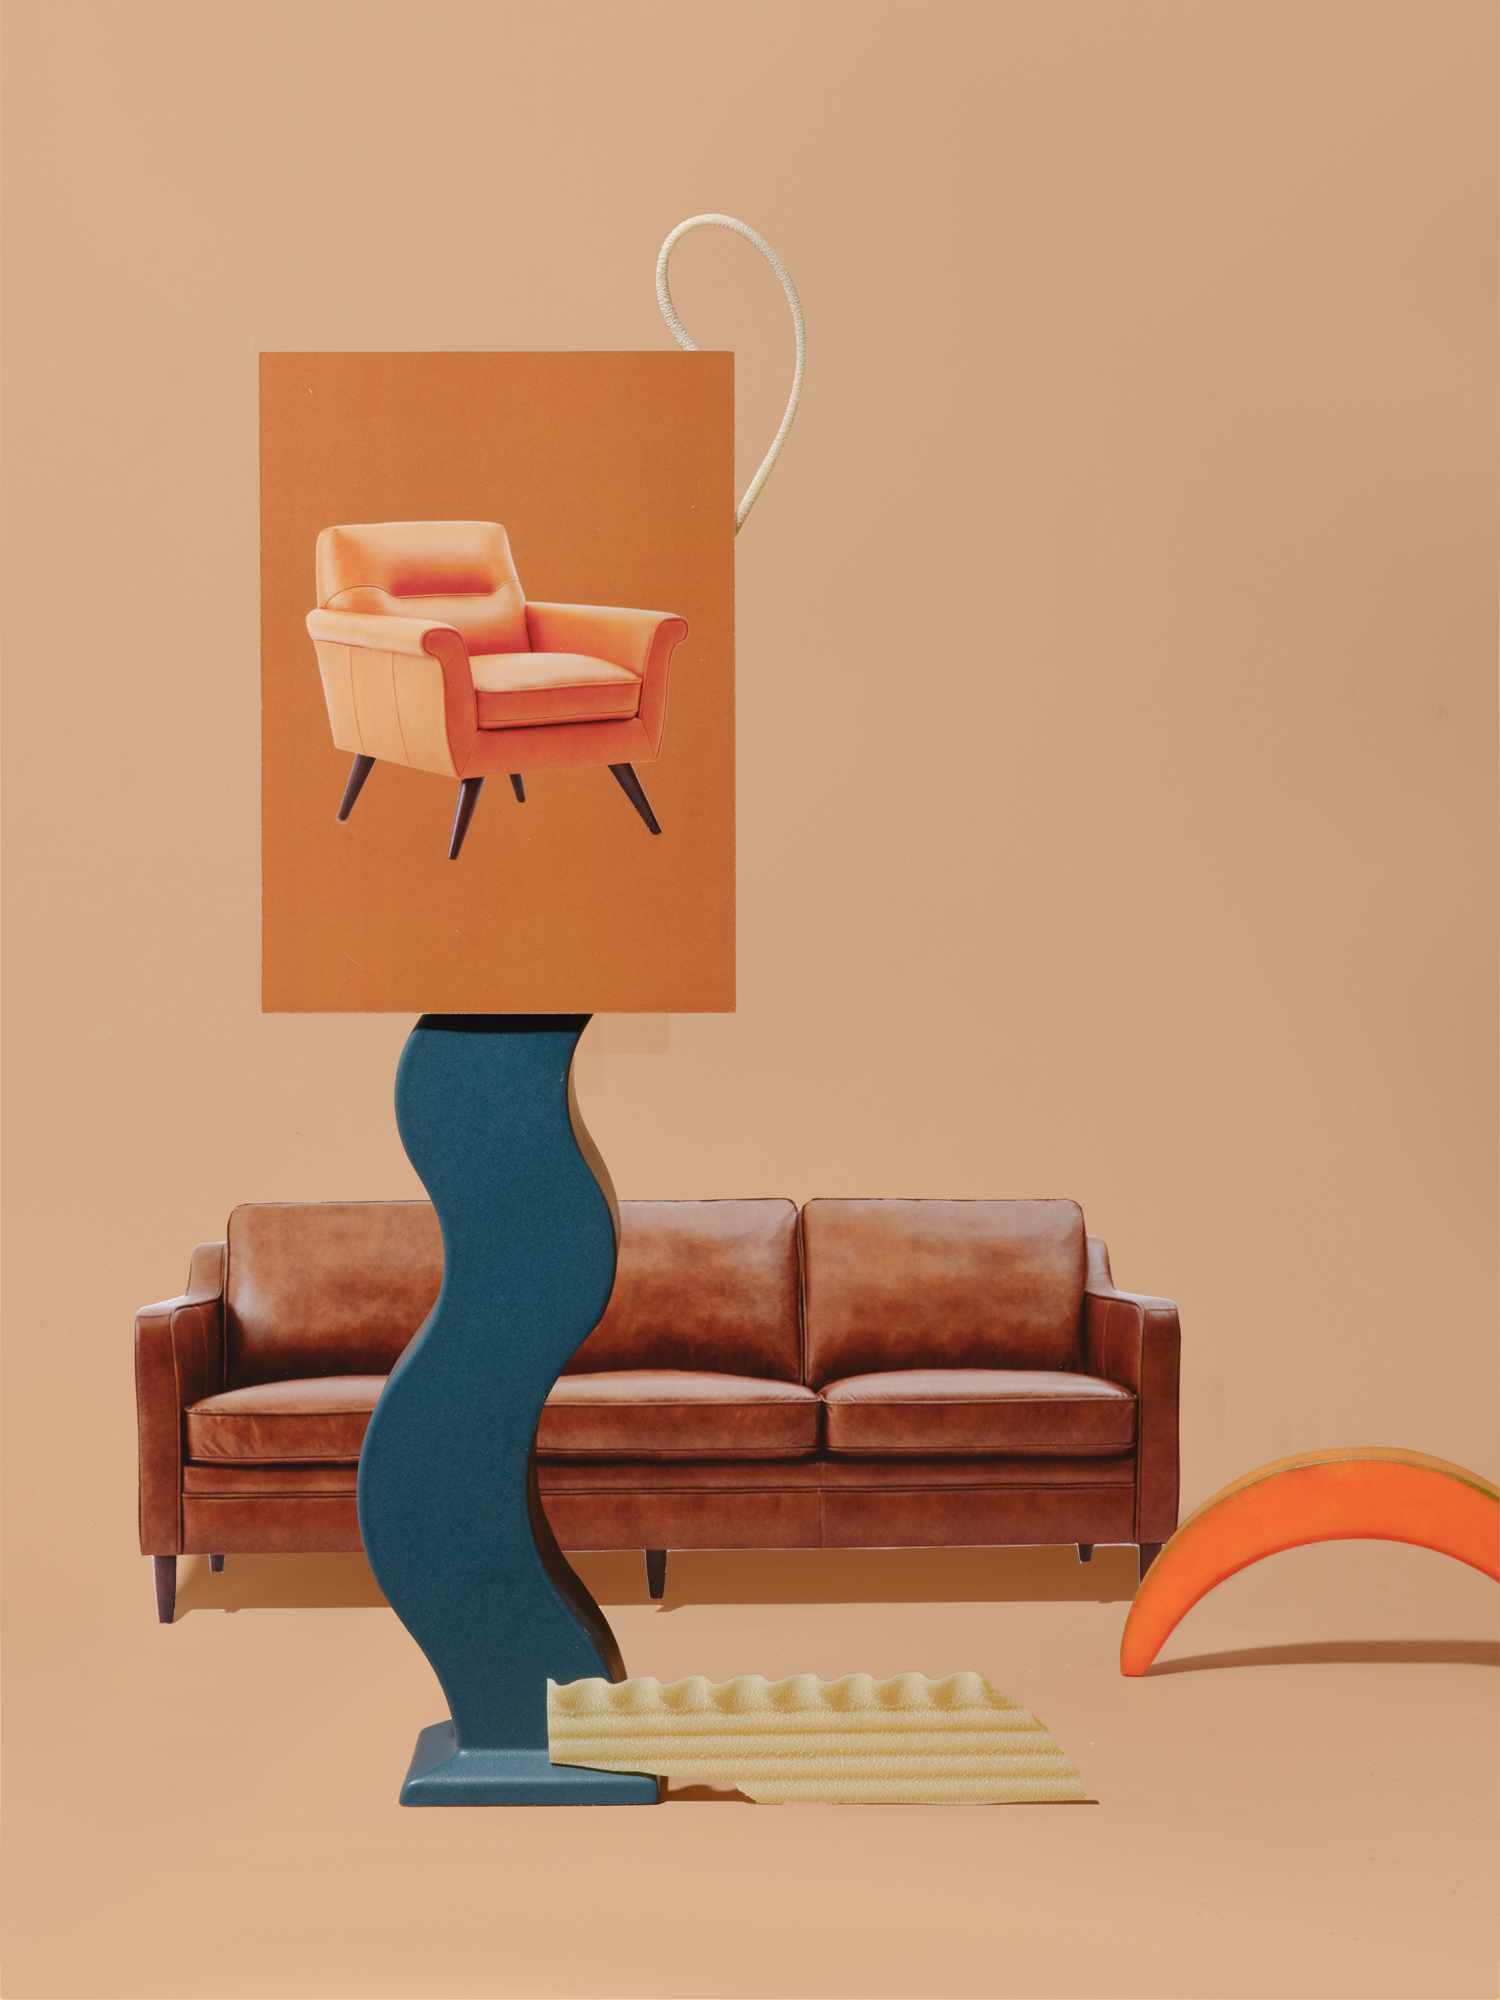 Wallpaper Furniture0520.jpg